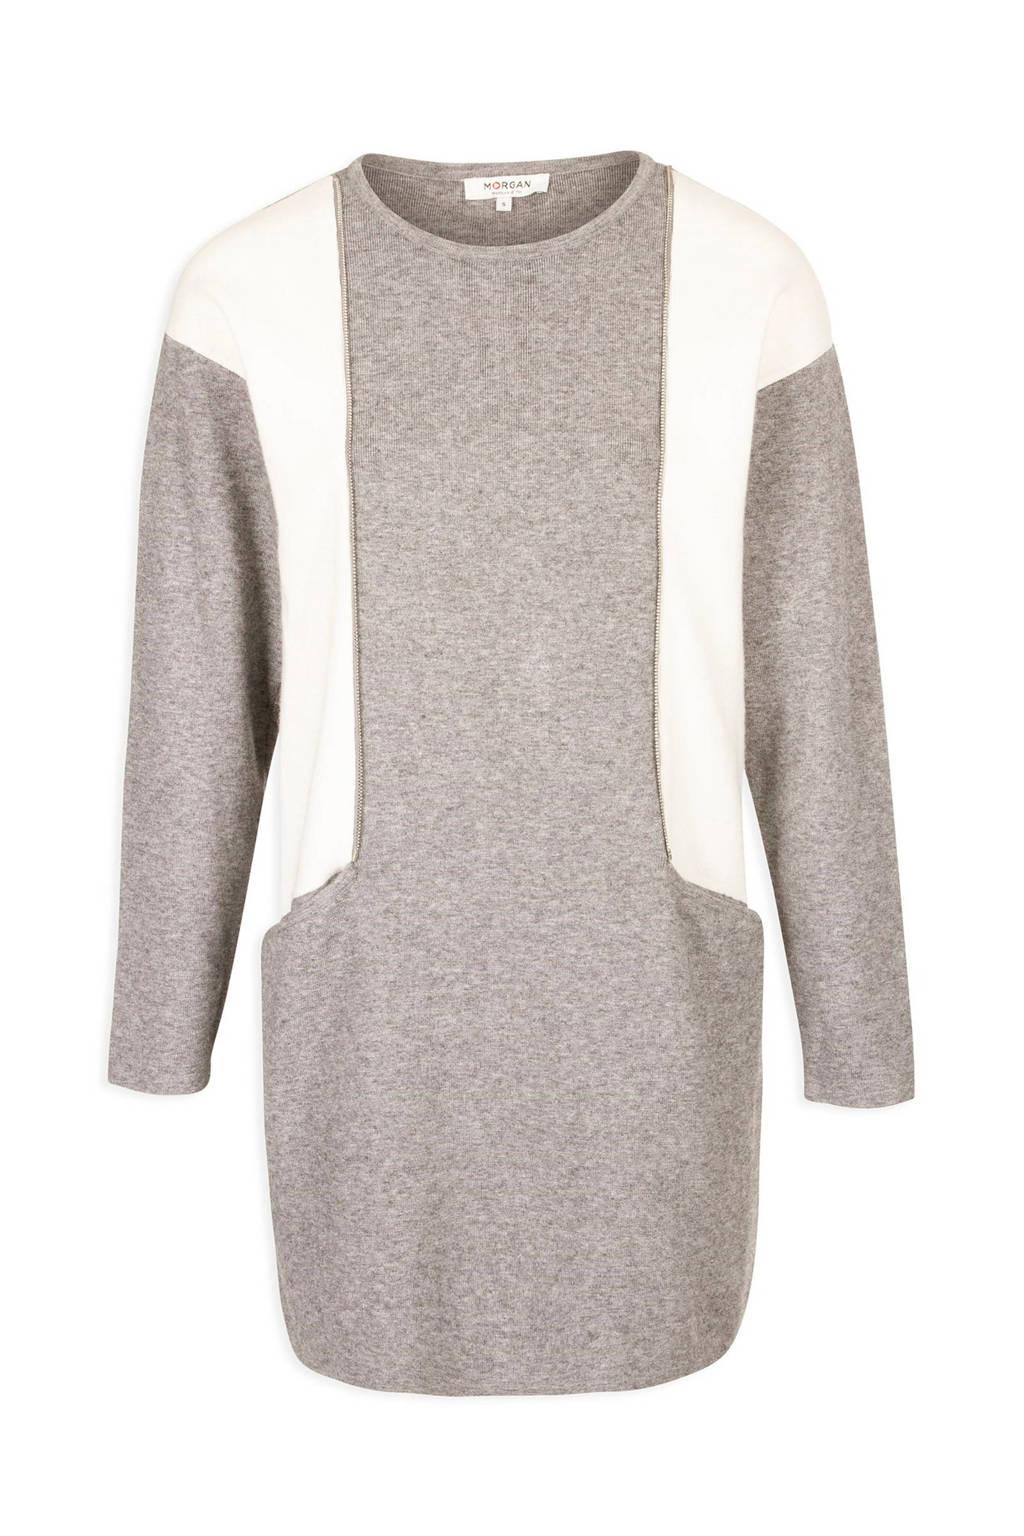 Morgan 2-kleurige jurk, GRIS MOYEN